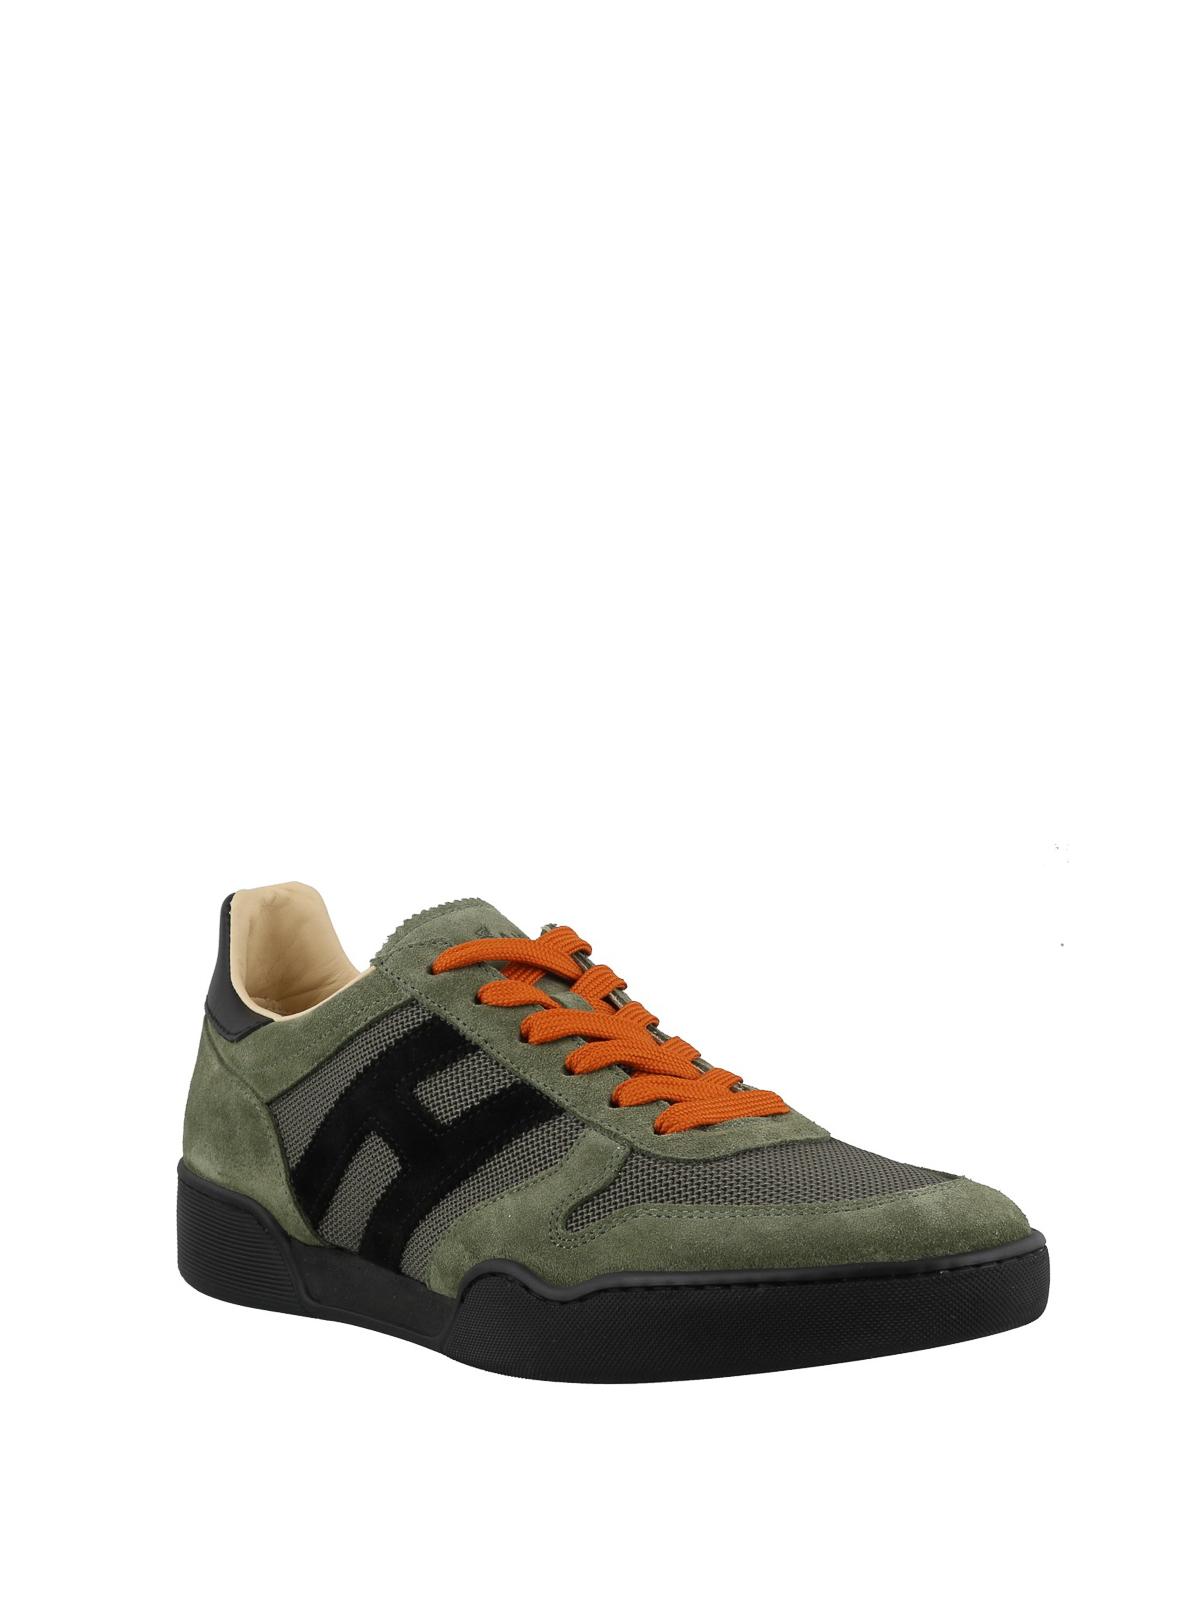 Trainers Hogan - H357 suede green sneakers - HXM3570AC40IPJ558L